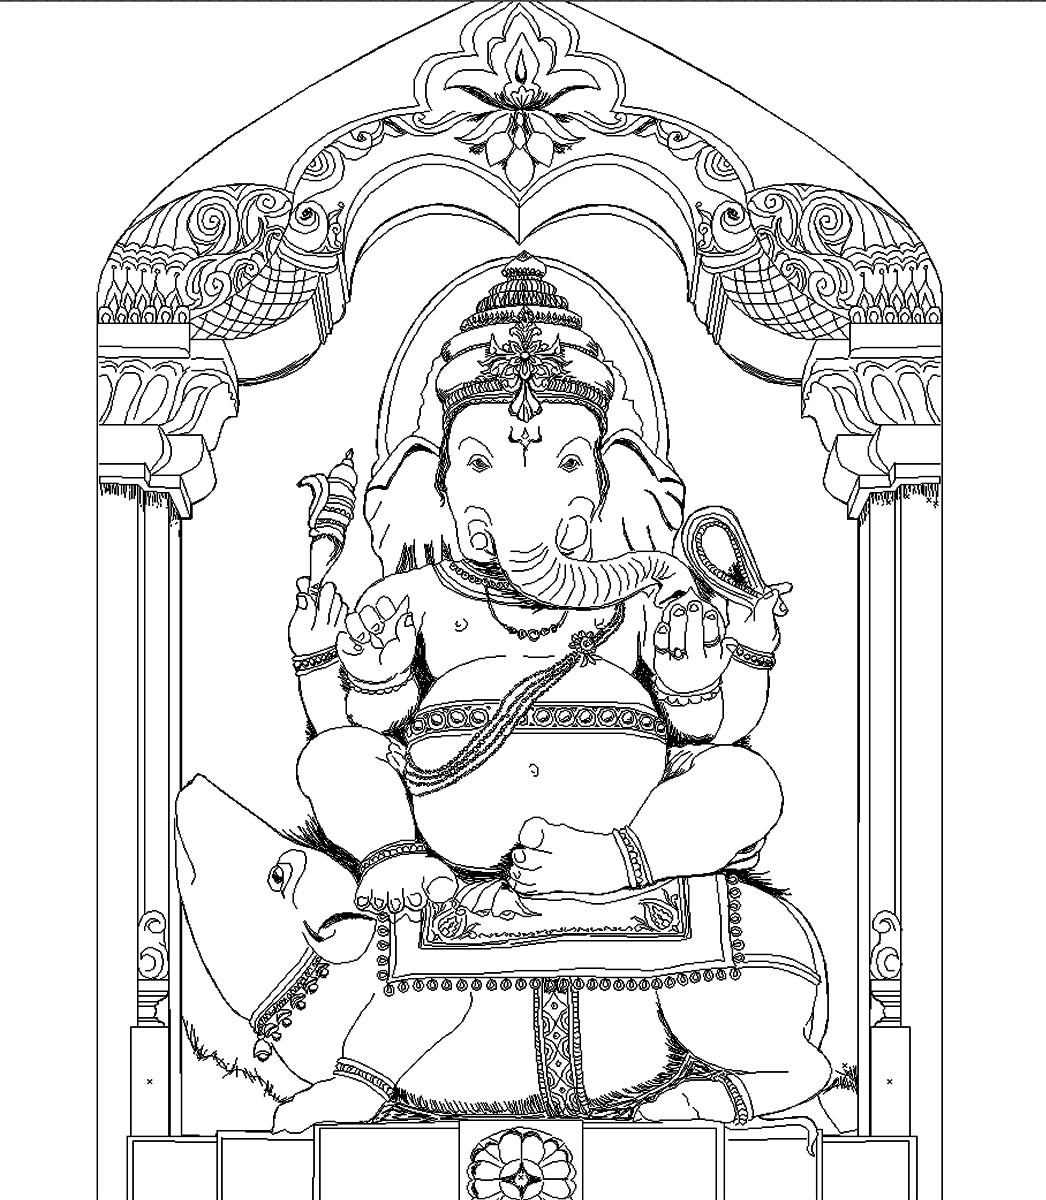 Rajesh sawant lordganeshwireframe